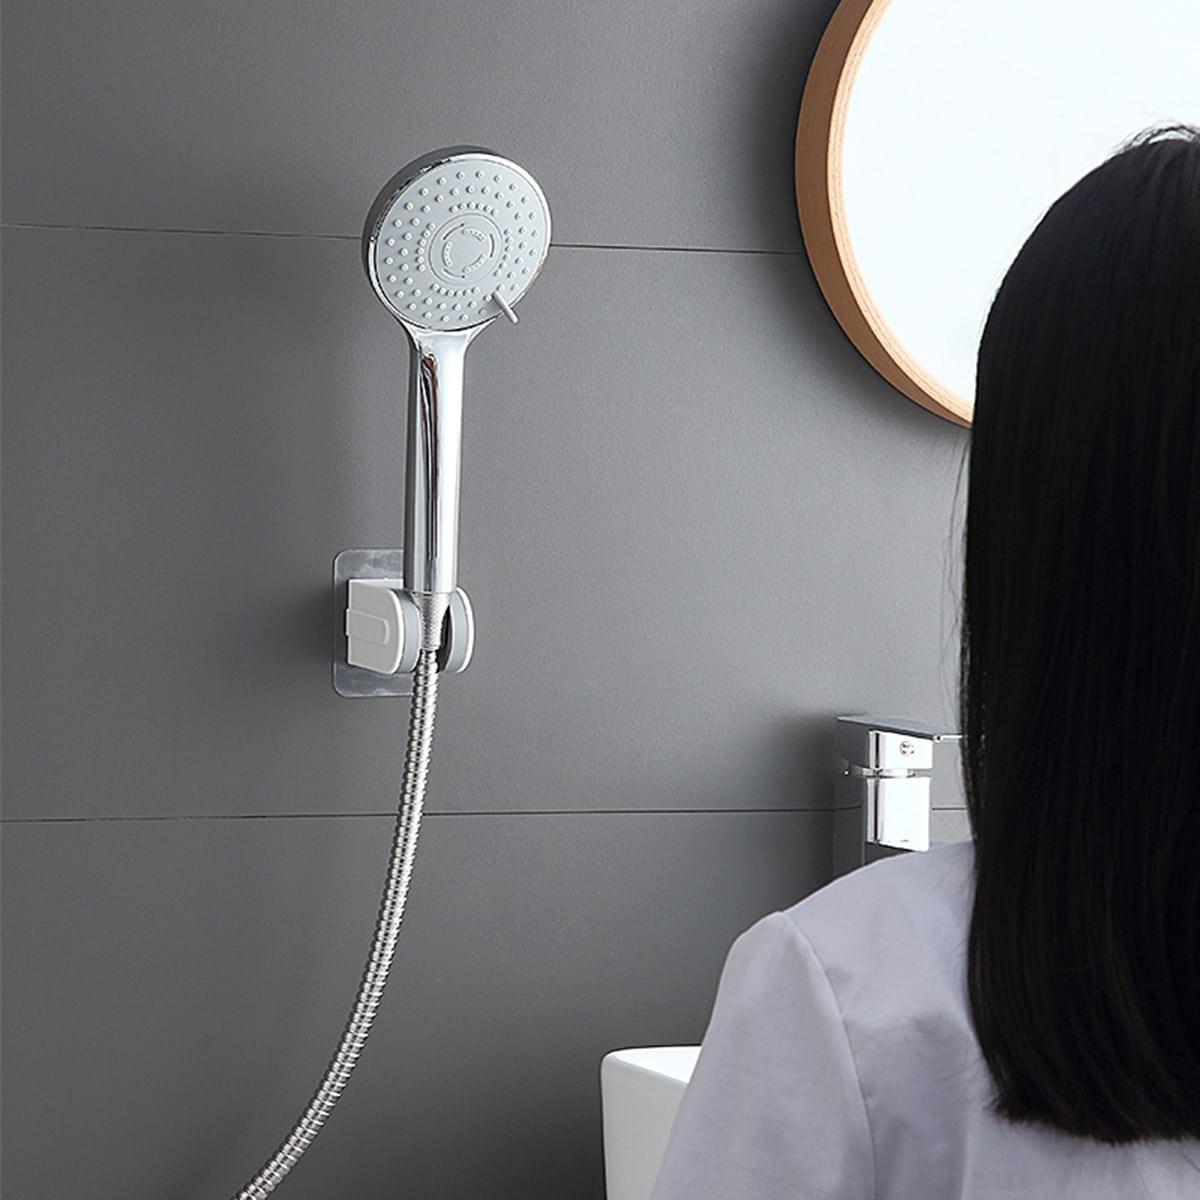 Аксессуары для ванны Аксессуары для ванной